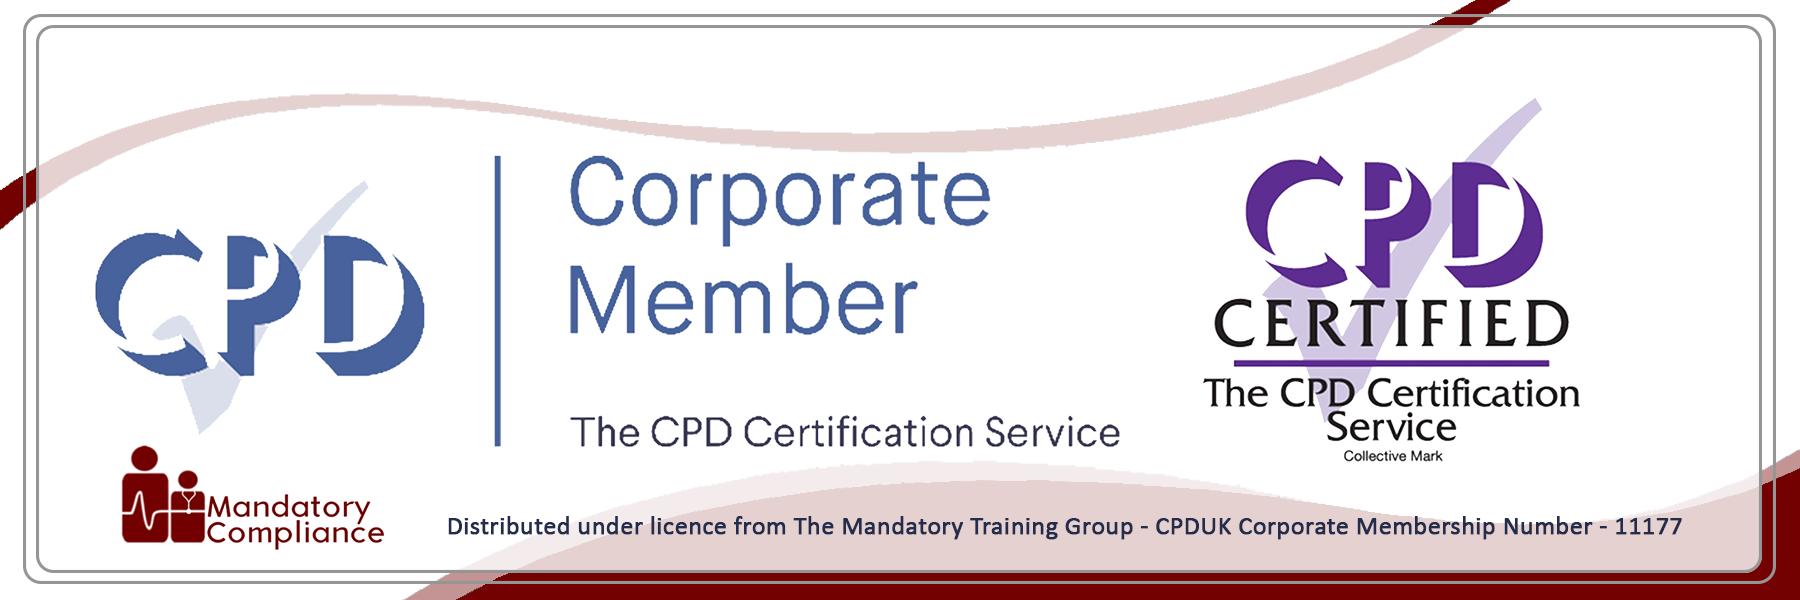 Mastering Microsoft Project 2016 - Part 1 - Online Training Course - The Mandatory Training Group UK -